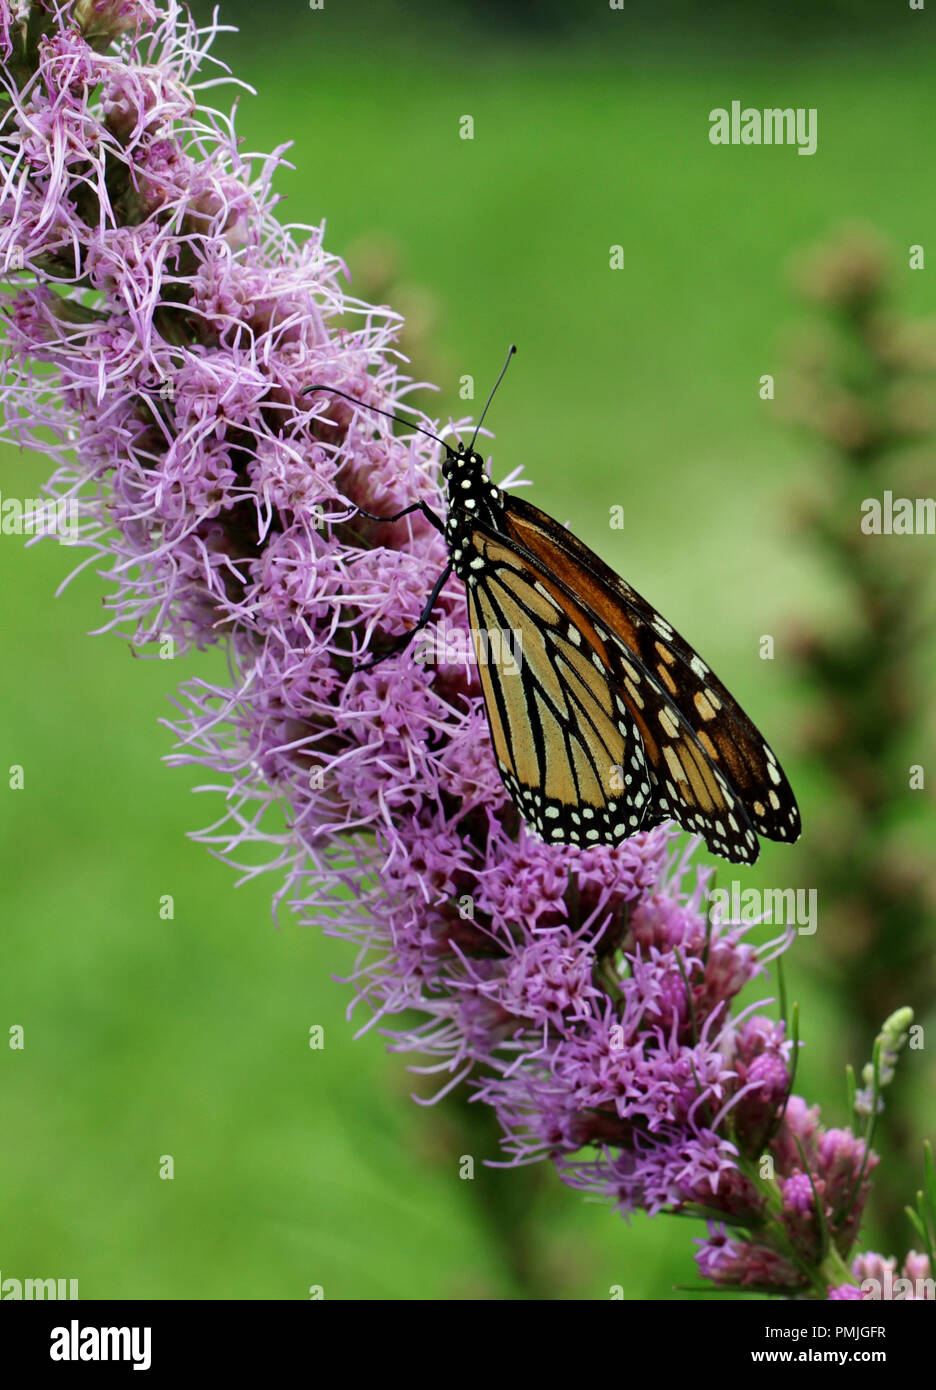 A Monarch butterfly (Danaus plexippus), also known as the milkweed butterfly, feeding in a garden on blazing star (Liatris spicata) Stock Photo